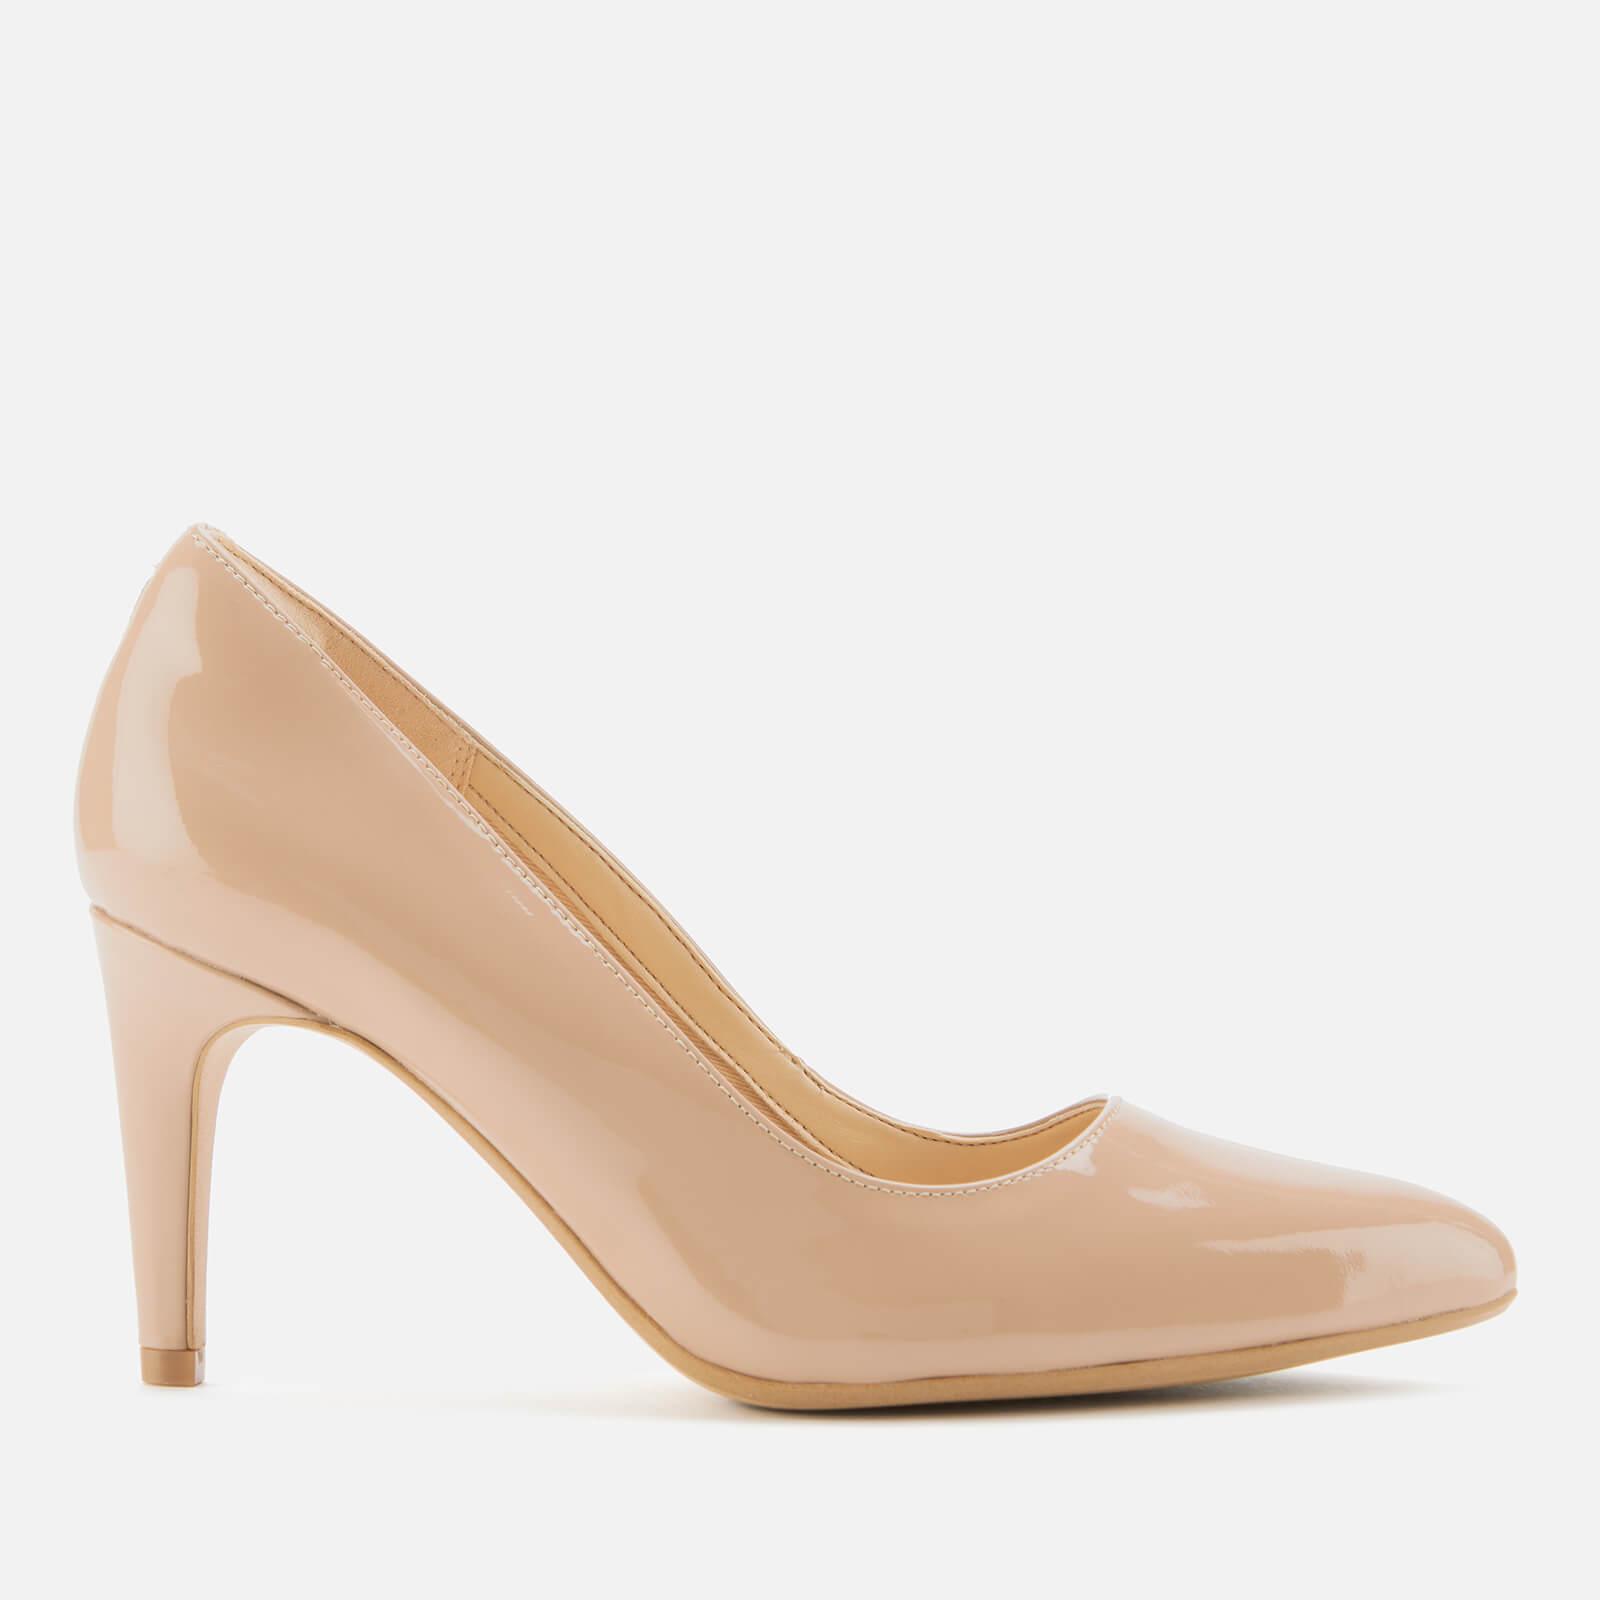 Clarks Women's Laina Rae Patent Court Shoes - Praline - UK 4